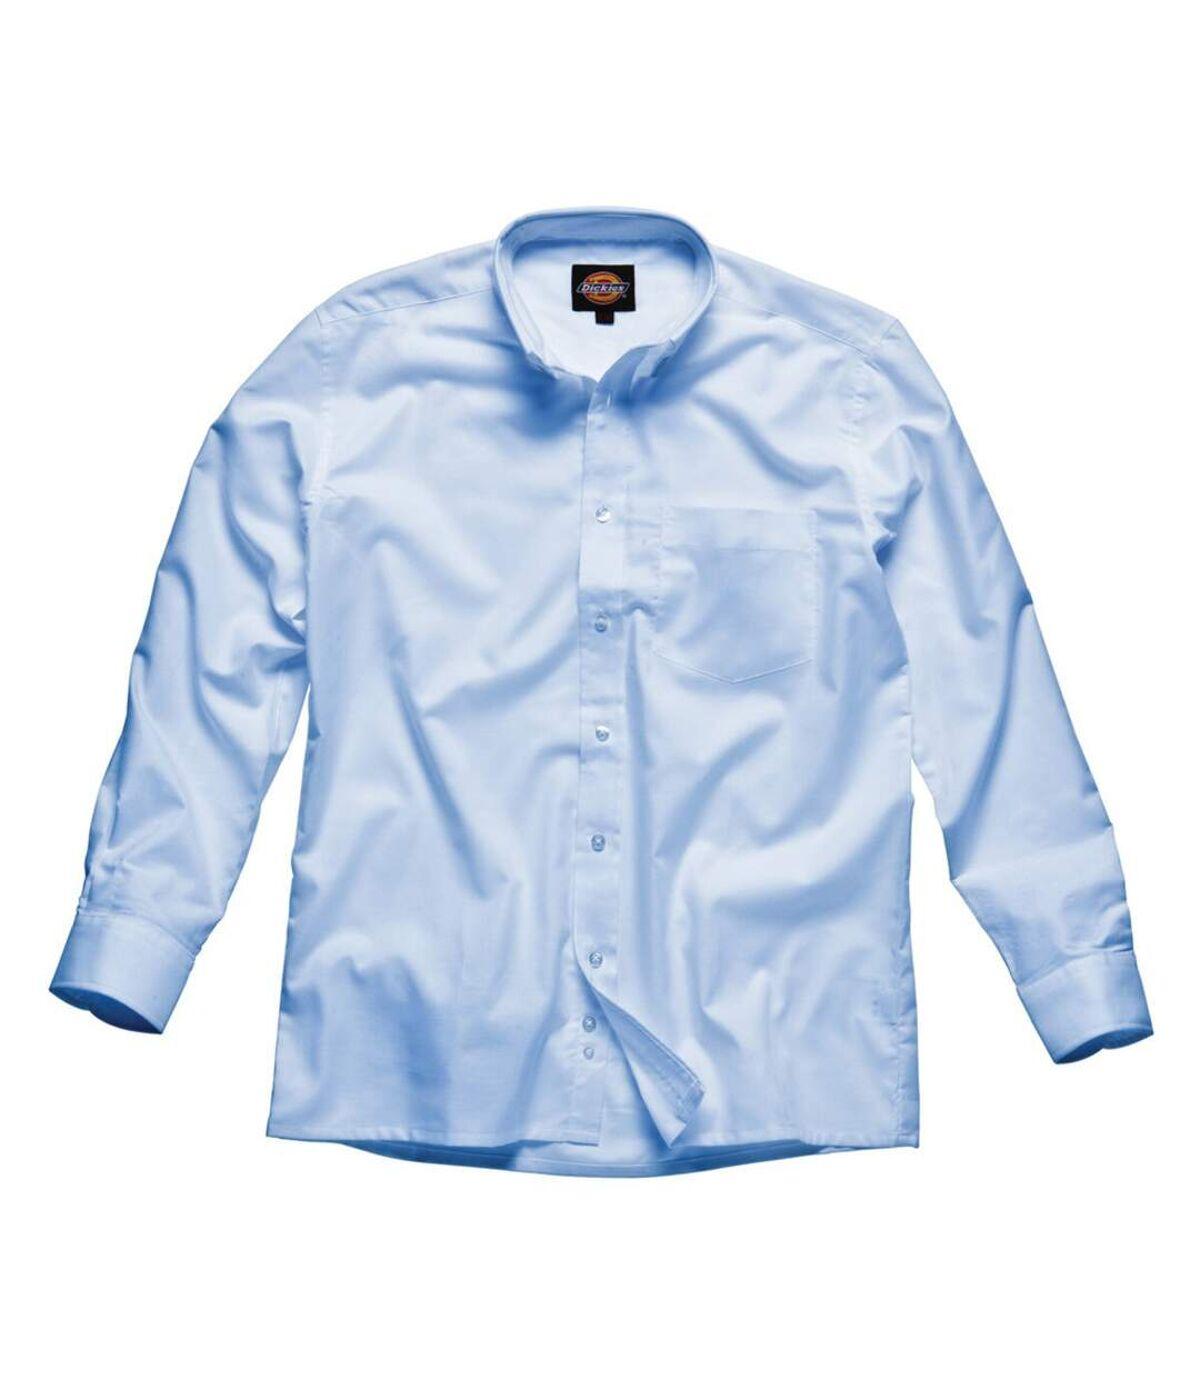 Dickies Long Sleeve Cotton/Polyester Oxford Shirt / Mens Shirts (Light Blue) - UTBC296